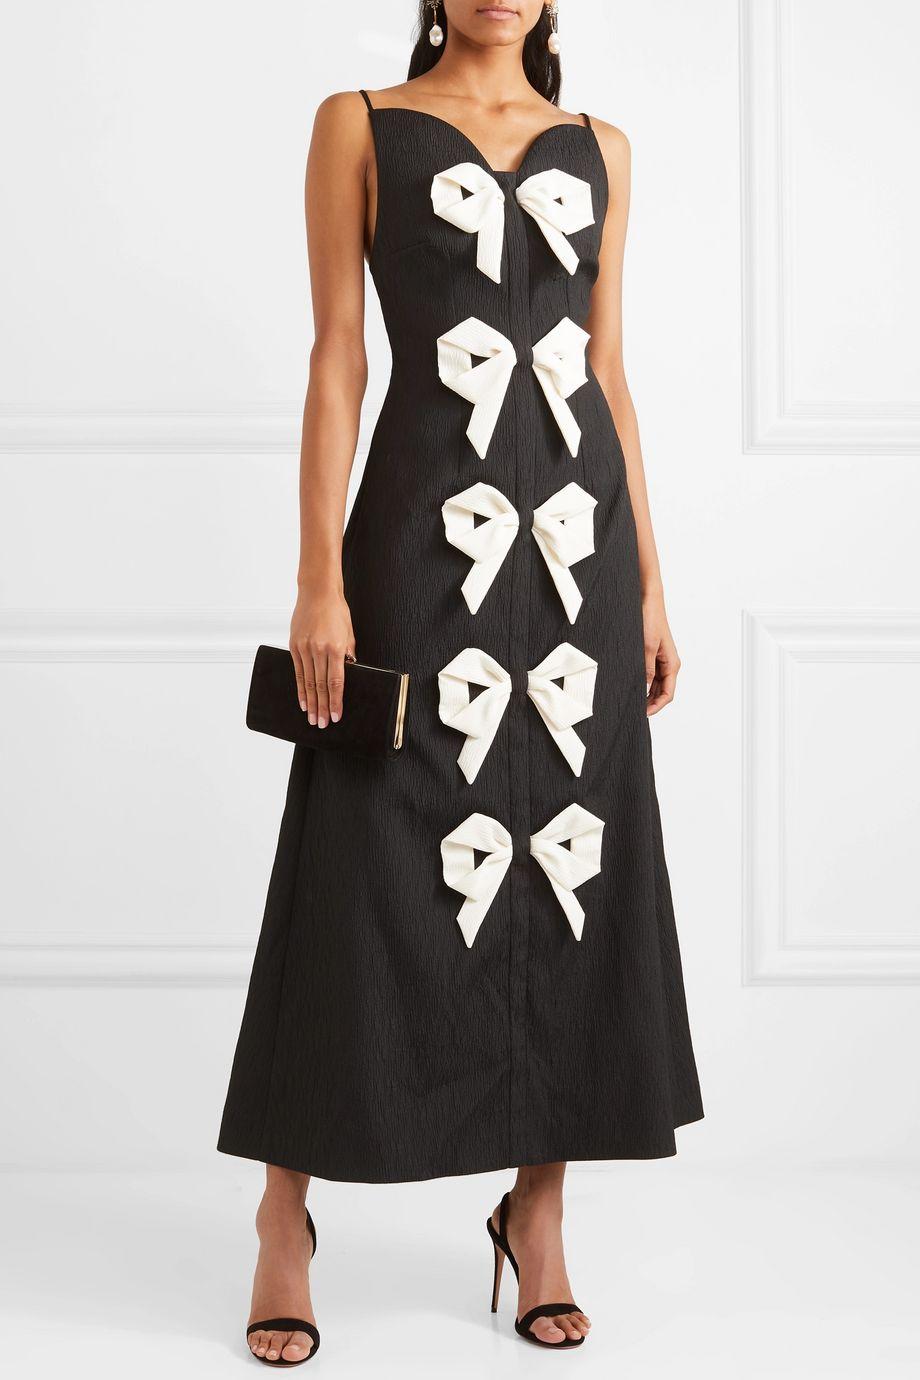 Emilia Wickstead Paris bow-detailed cloqué dress